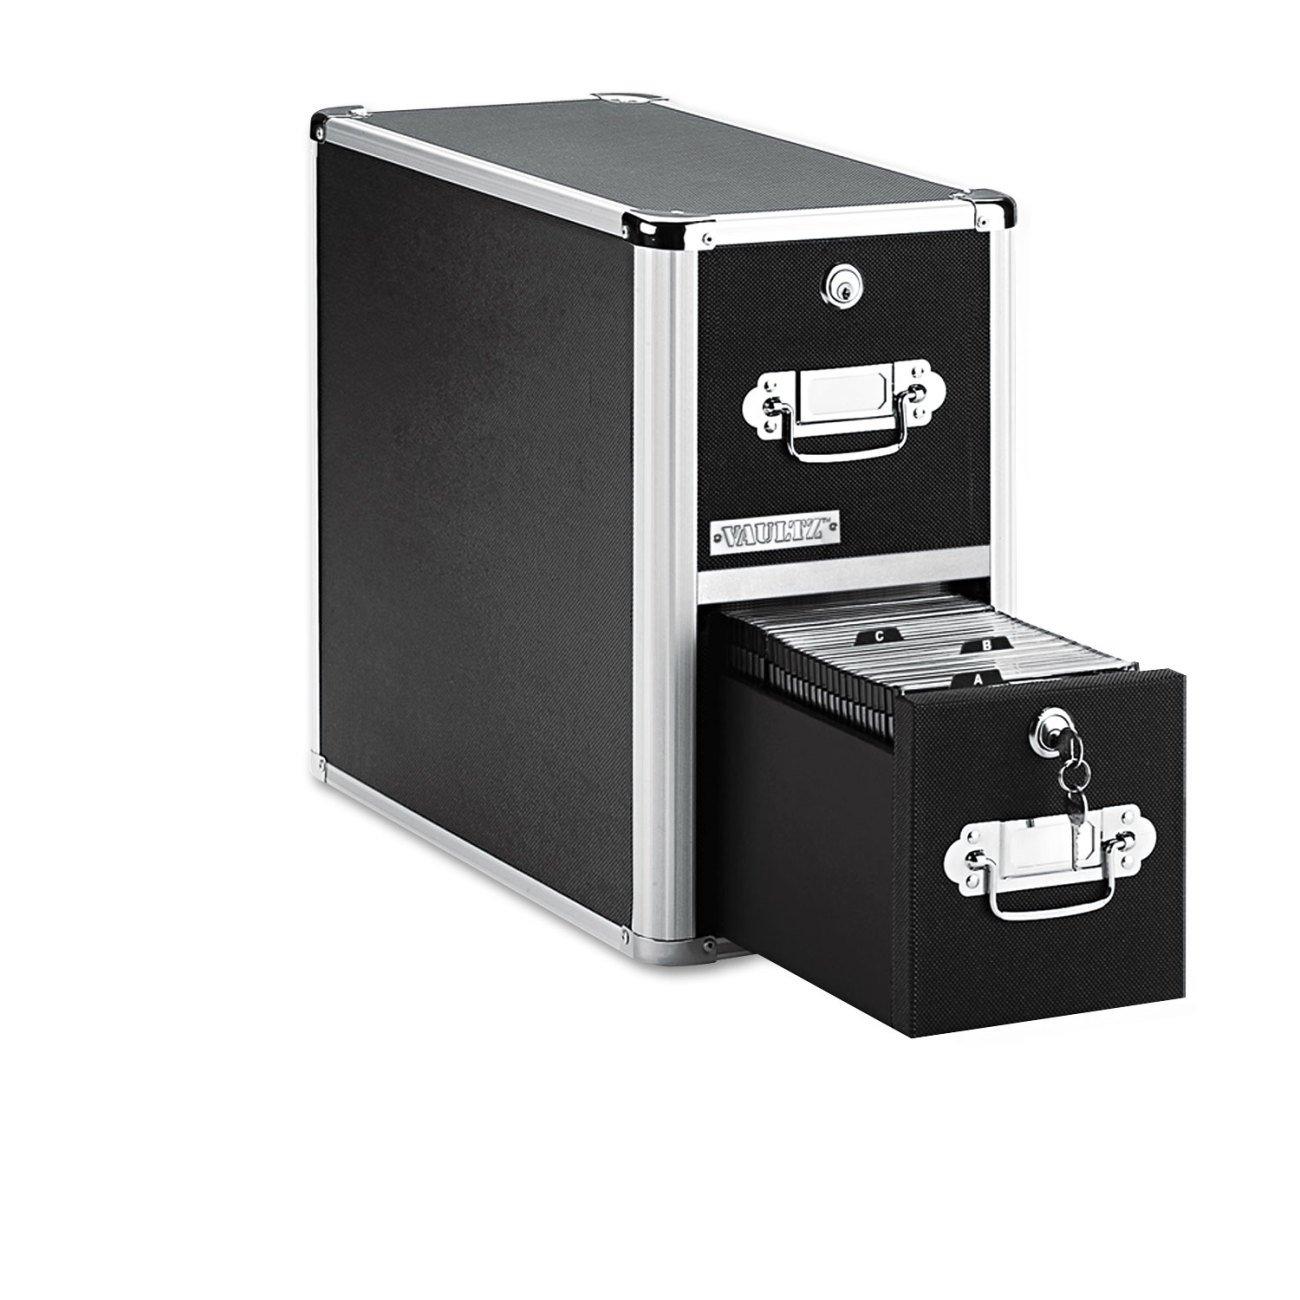 Vaultz Locking CD File Cabinet, 2 Drawers, 8 x 14.5 x 15.5 Inches, Black (VZ01094) by Vaultz